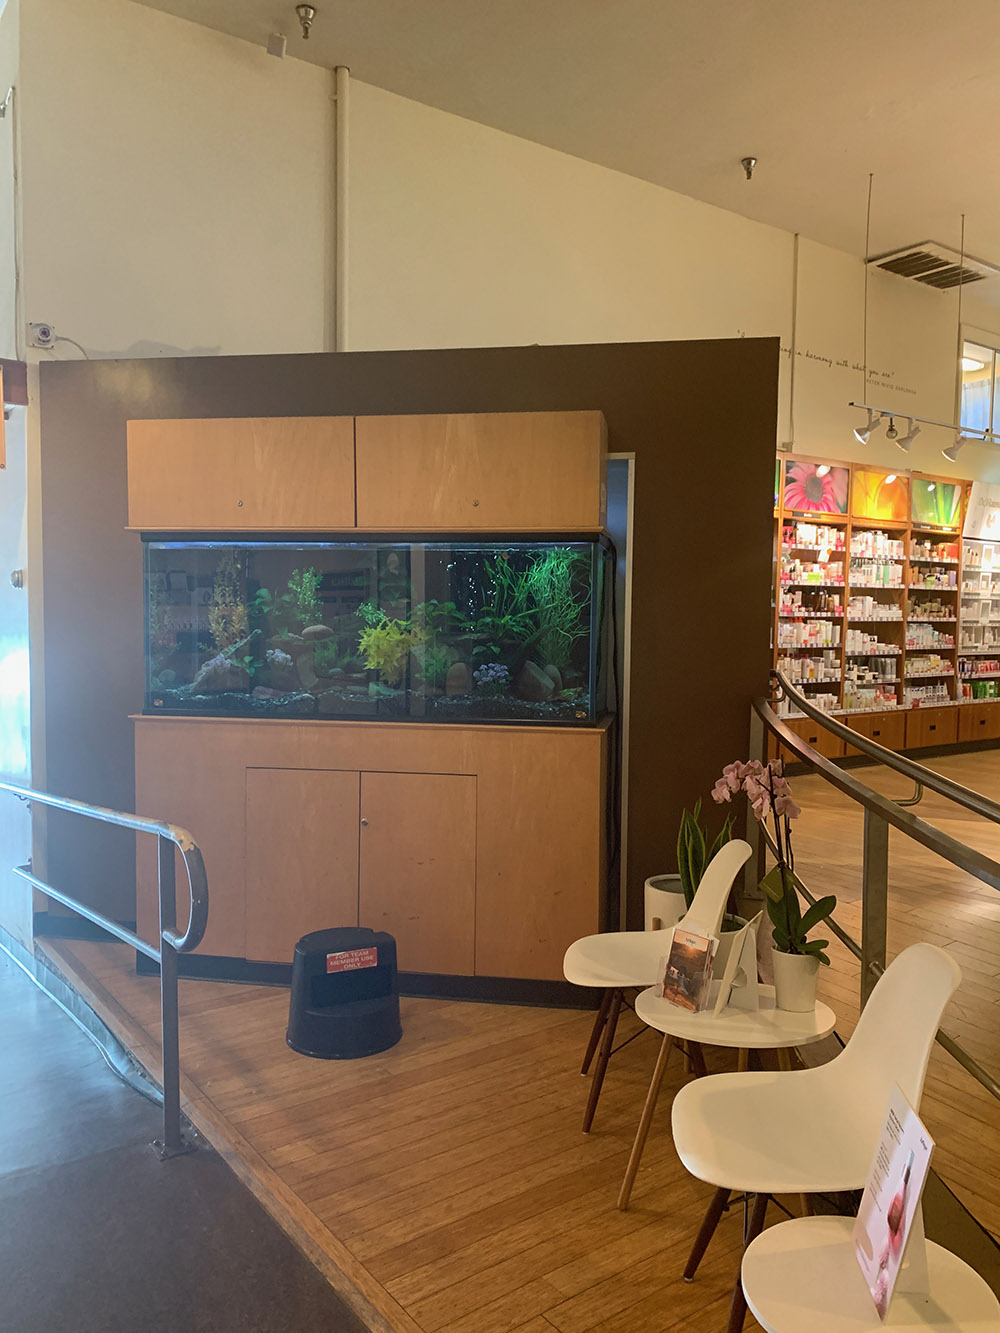 The waiting area includes a calming aquarium.